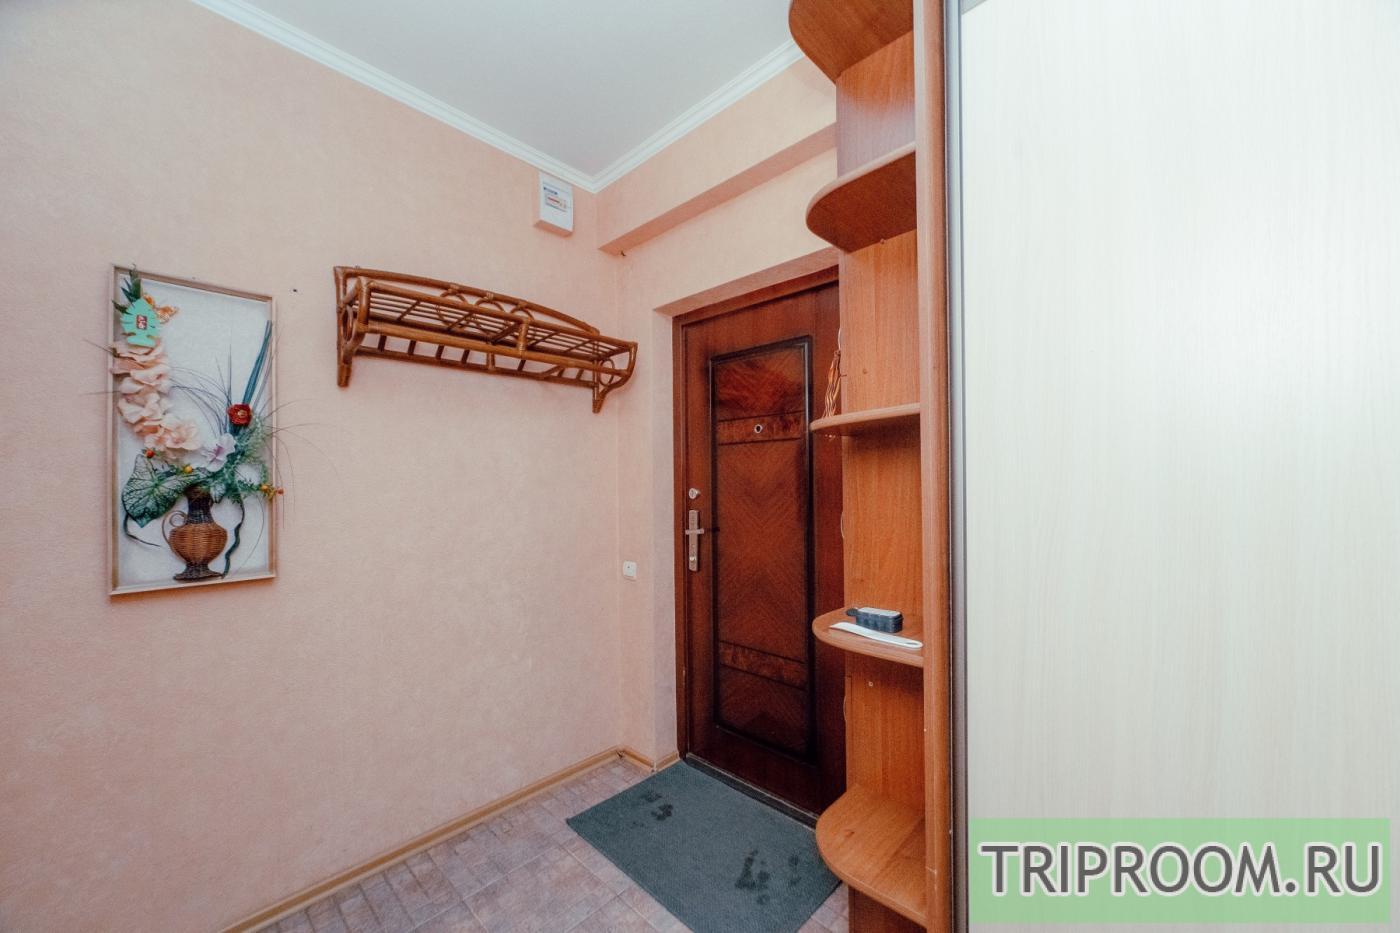 2-комнатная квартира посуточно (вариант № 19543), ул. Тукая улица, фото № 12